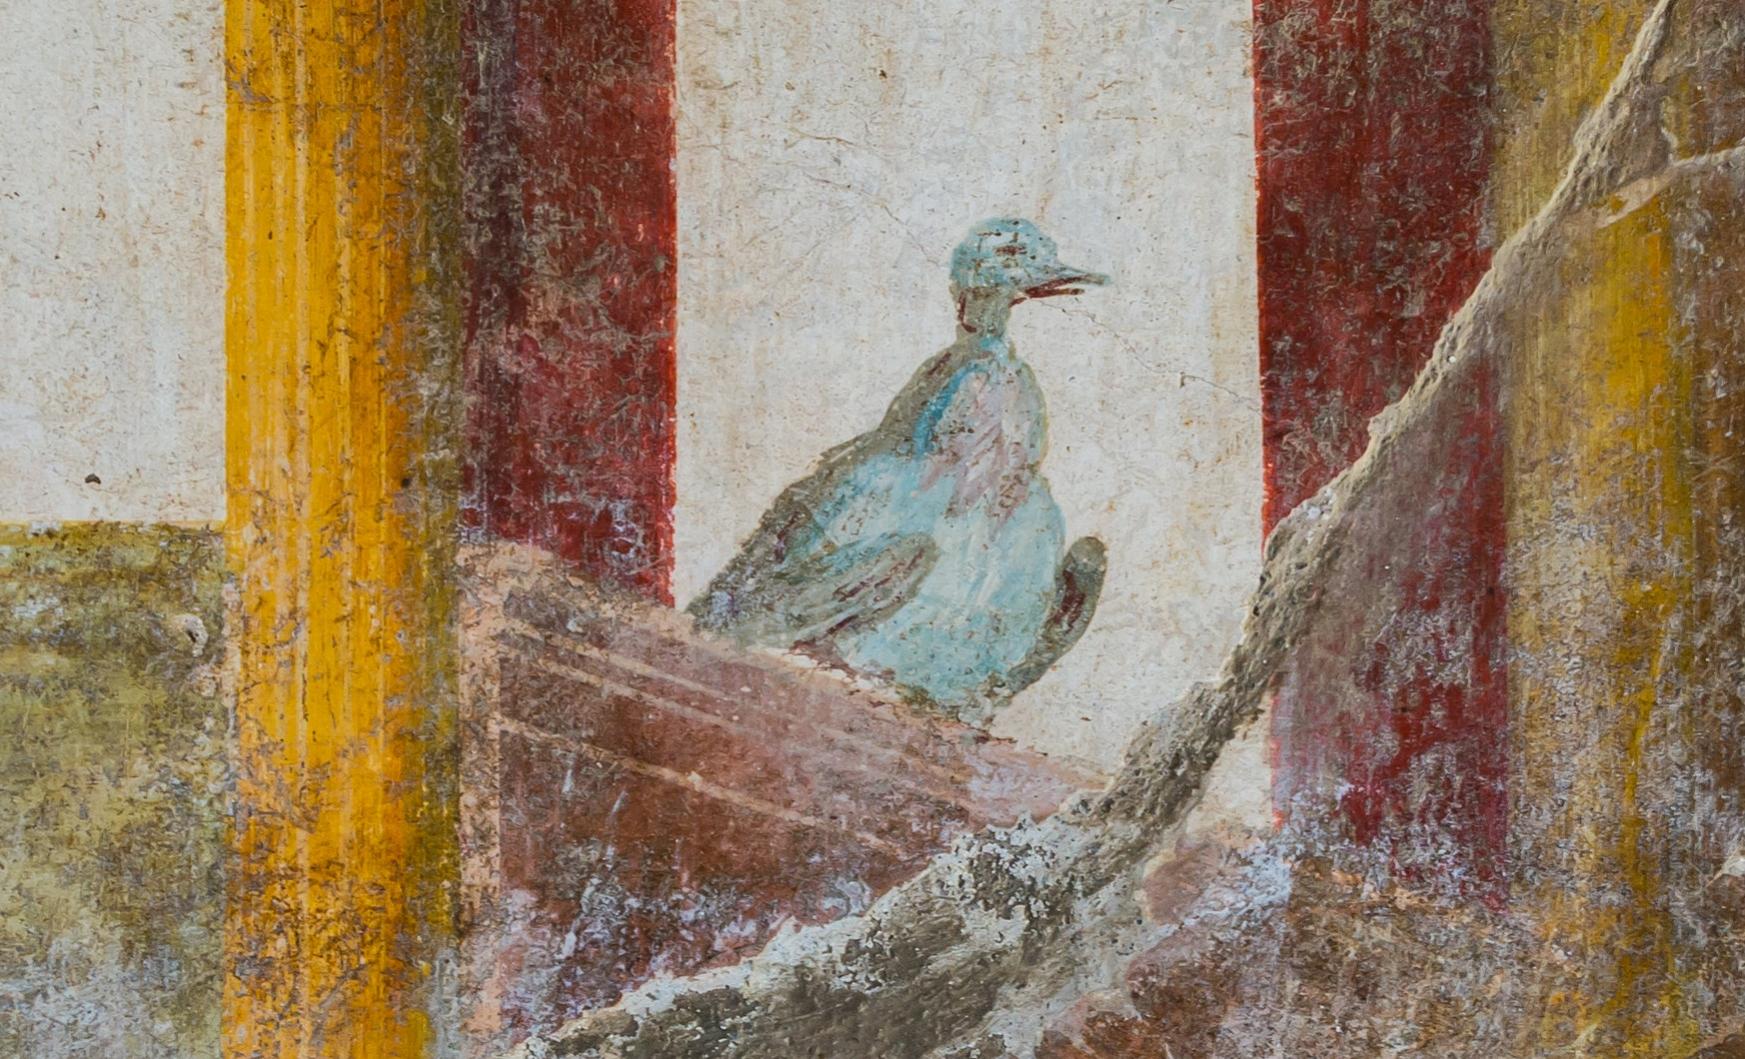 This pigeon decorates a fresco at an ancient Roman site near Pompeii.